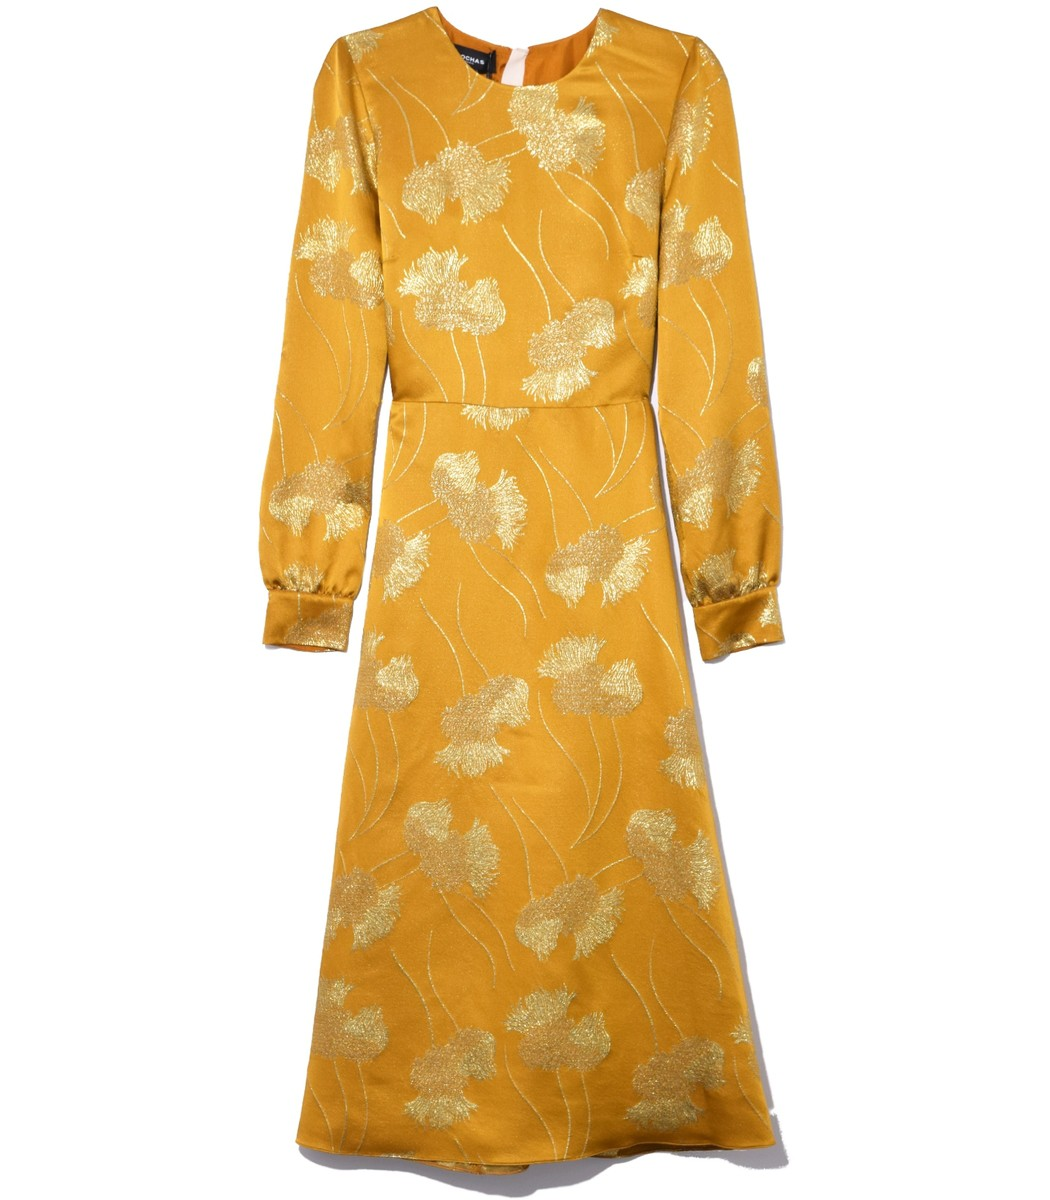 ROCHAS Medium Orange Floral A Line Dress